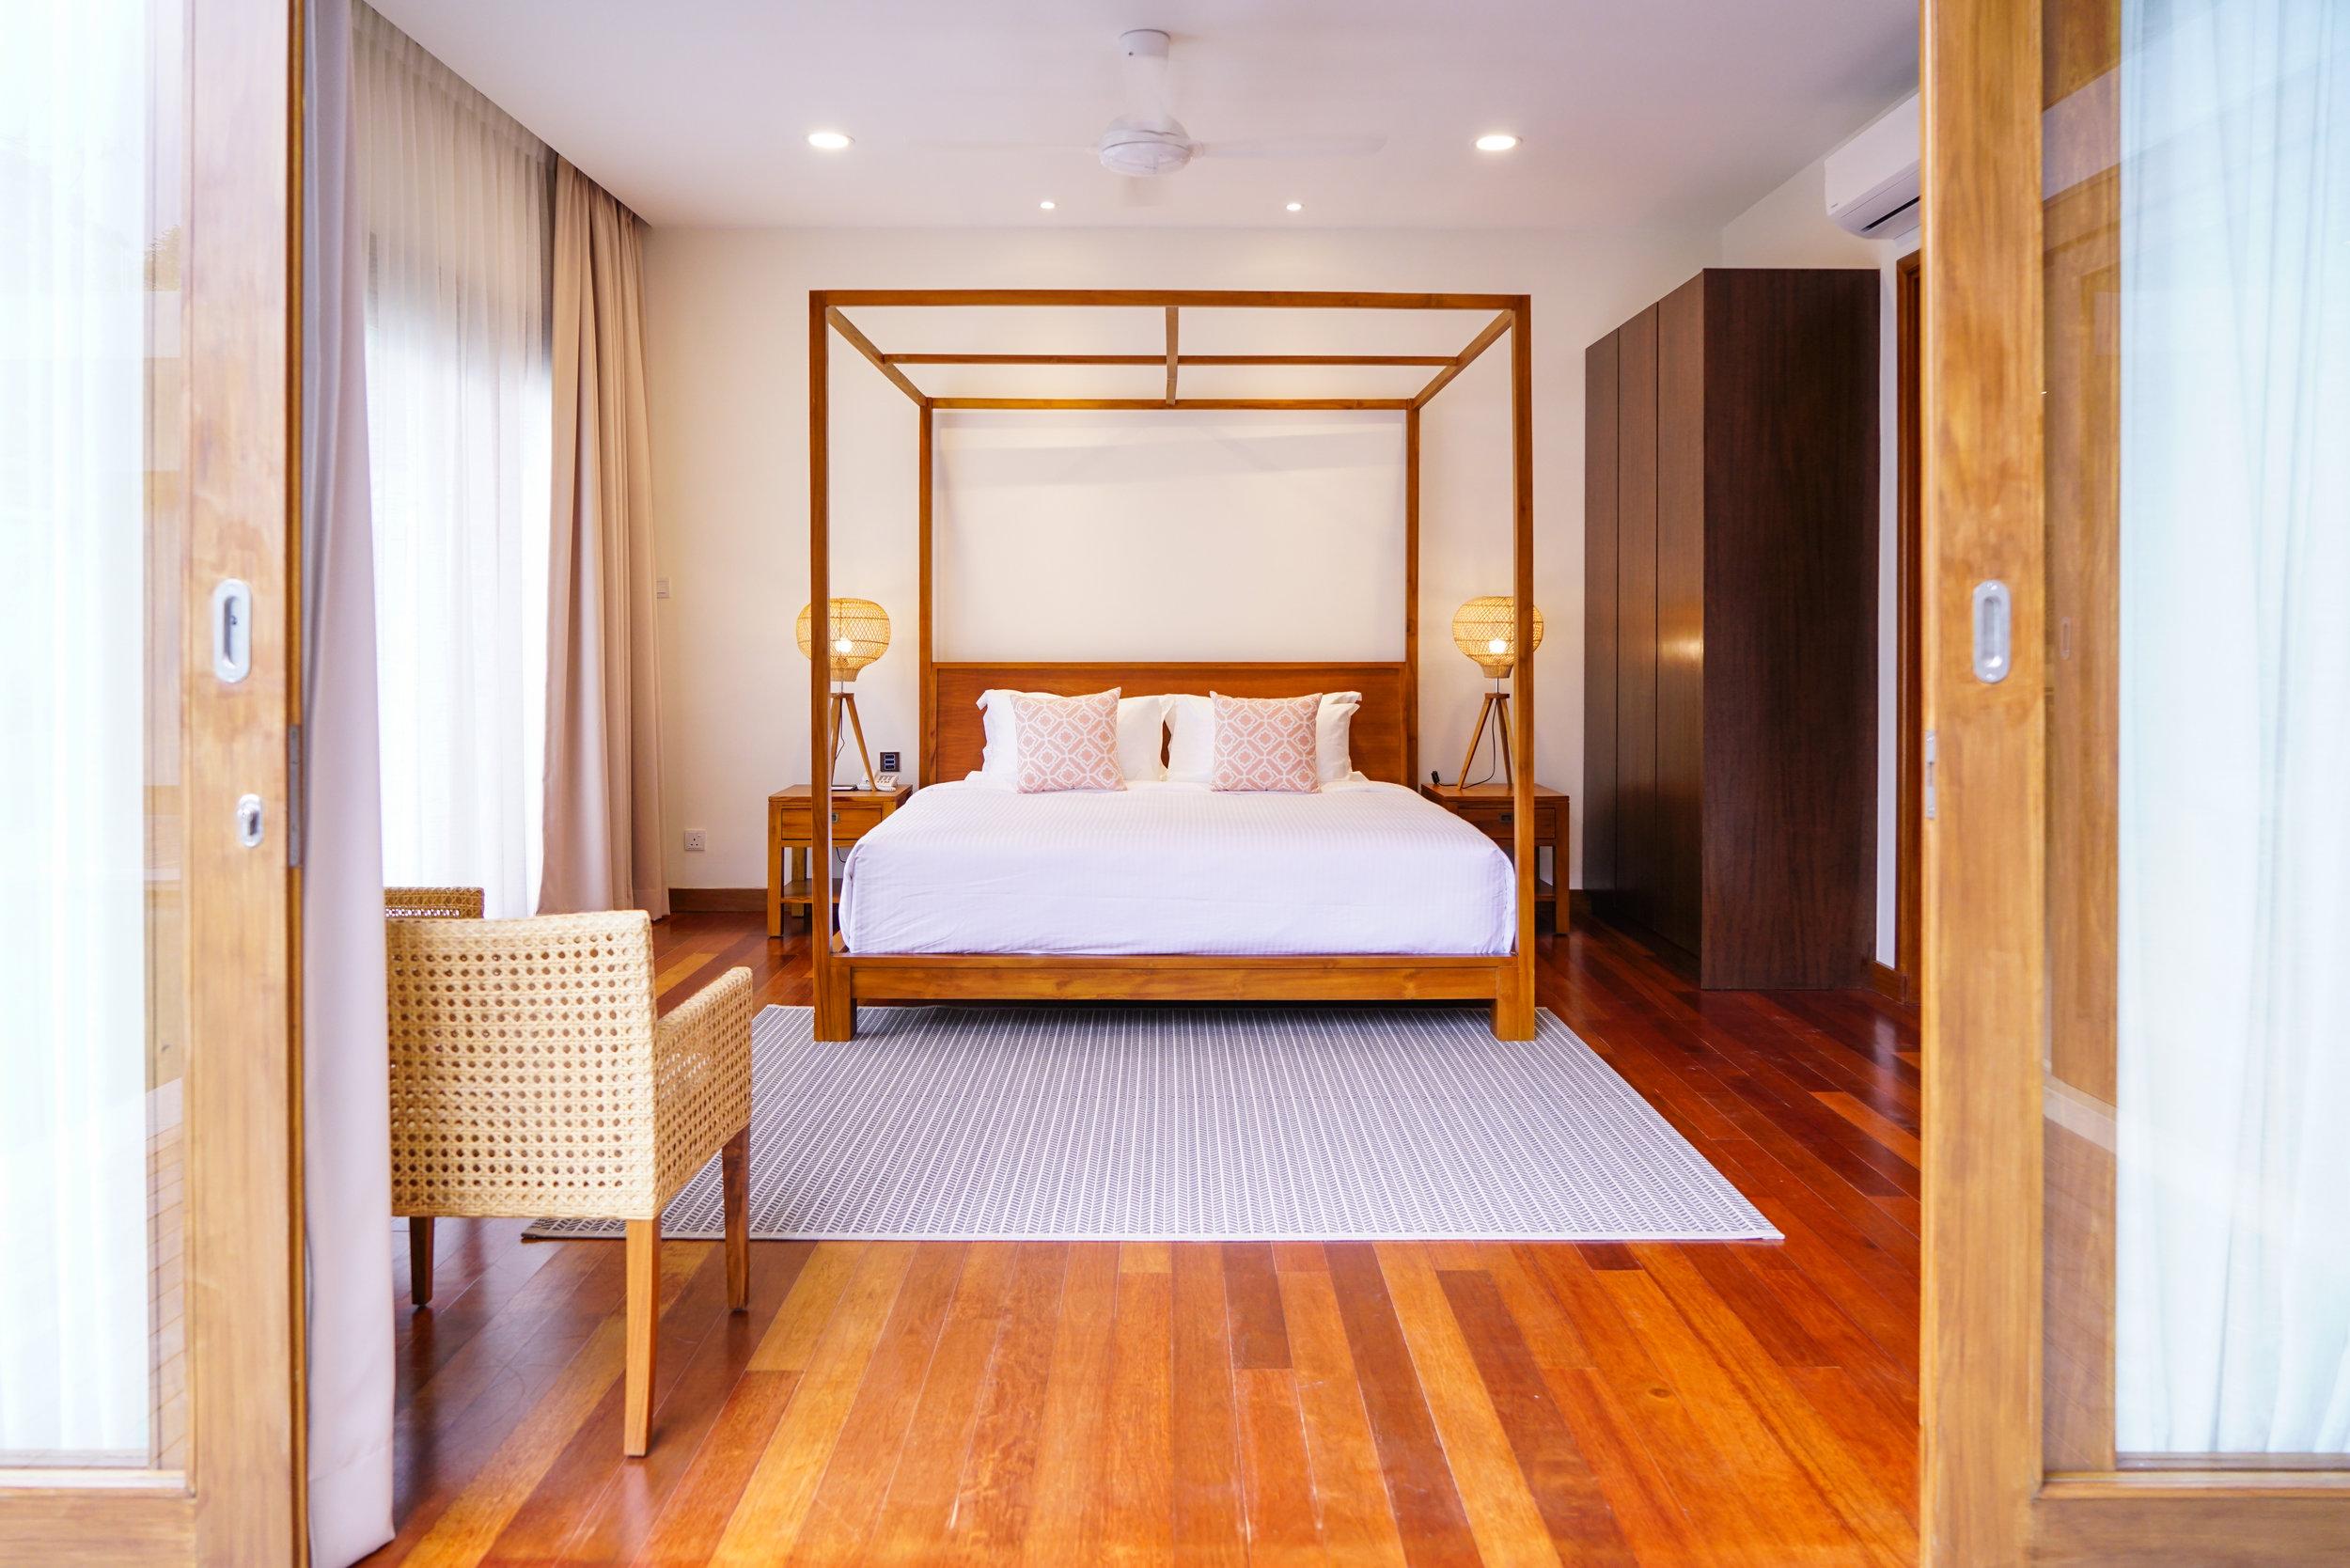 - BEDROOM 2, VILLA KANTAN @ EMBUN LUXURY VILLAS